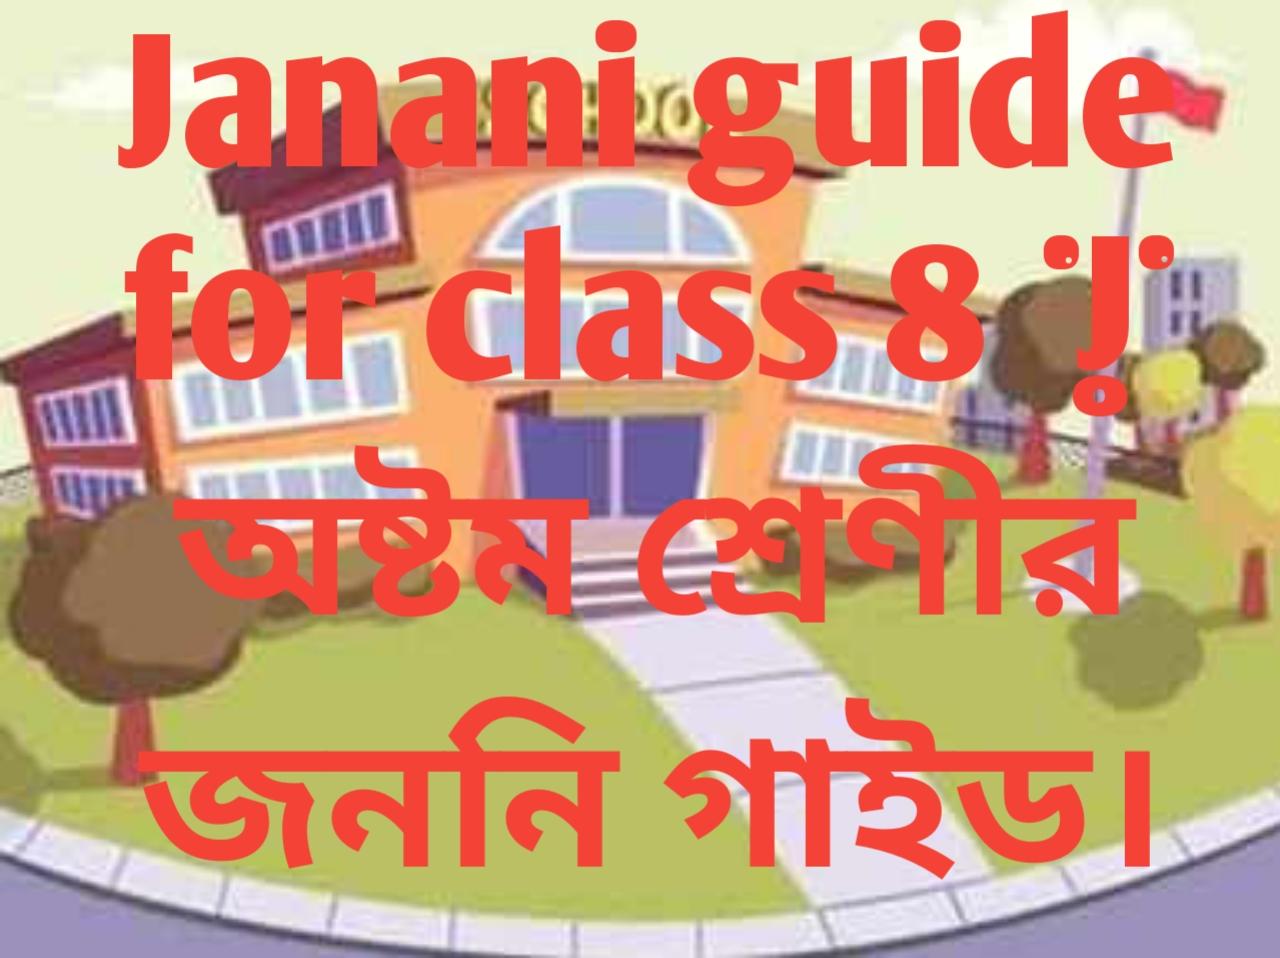 class 8 janani guide 2021, class 8 janani guide pdf, class 8 janani guide book 2021, class 8 math solution janani guide, janani guide class 8, janani guide for class 7, janani guide for class 8 english, janani guide for class 8 math, janani guide for class 8 science, janani guide for class 8 Bangladesh and global studies, janani guide for class 8, janani guide for class 8 hindu dharma, janani guide for class 7 ICT, janani guide for class 8 home science, janani guide for class 8 agriculture education, janani guide for class 8 physical education, অষ্টম শ্রেণীর বাংলা গাইড জননী ডাউনলোড, অষ্টম শ্রেণীর বাংলা গাইড এর পিডিএফ, অষ্টম শ্রেণির বাংলা জননী গাইড পিডিএফ ২০২১, অষ্টম শ্রেণীর জননী গাইড ২০২১, অষ্টম শ্রেণির ইংরেজি জননী গাইড, অষ্টম শ্রেণীর গণিত জননী গাইড, অষ্টম শ্রেণীর জননী গাইড বিজ্ঞান, শ্রেণীর জননী গাইড বাংলাদেশ ও বিশ্বপরিচয়, অষ্টম শ্রেণীর জননী গাইড ইসলাম শিক্ষা, অষ্টম শ্রেণীর জননী গাইড হিন্দুধর্ম, অষ্টম শ্রেণীর জননী গাইড গার্হস্থ্য বিজ্ঞান, অষ্টম শ্রেণীর জননী গাইড কৃষি শিক্ষা, অষ্টম শ্রেণীর জননী গাইড তথ্য যোগাযোগ প্রযুক্তি, অষ্টম শ্রেণীর জননী গাইড শারীরিক শিক্ষা,